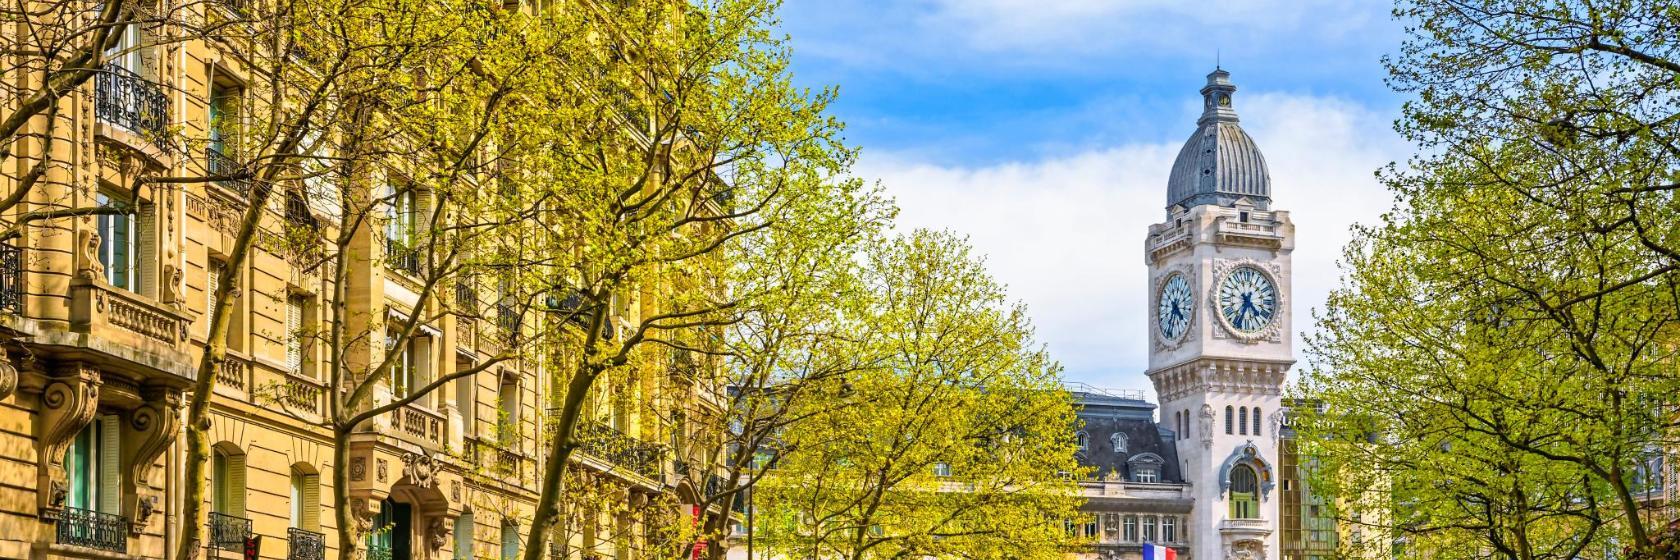 Libertel Austerlitz Jardin Des Plantes Génial 10 NajboljÅ¡ih Hotelov Blizu Znamenitosti železniÅ¡ka Postaja Of 66 Élégant Libertel Austerlitz Jardin Des Plantes